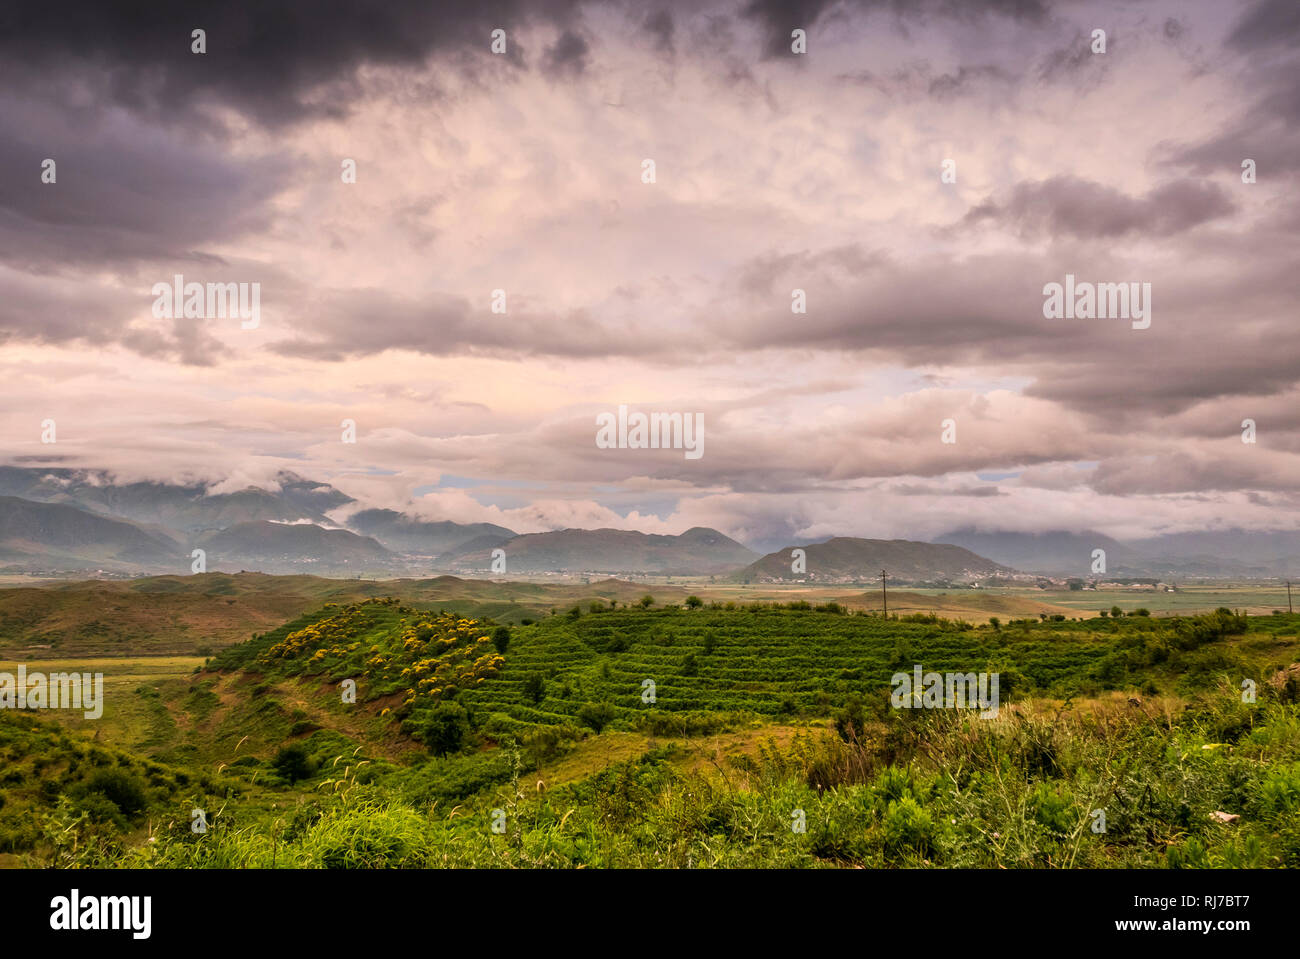 Albanien, Balkanhalbinsel, Südosteuropa, Republik Albanien, - Stock Image